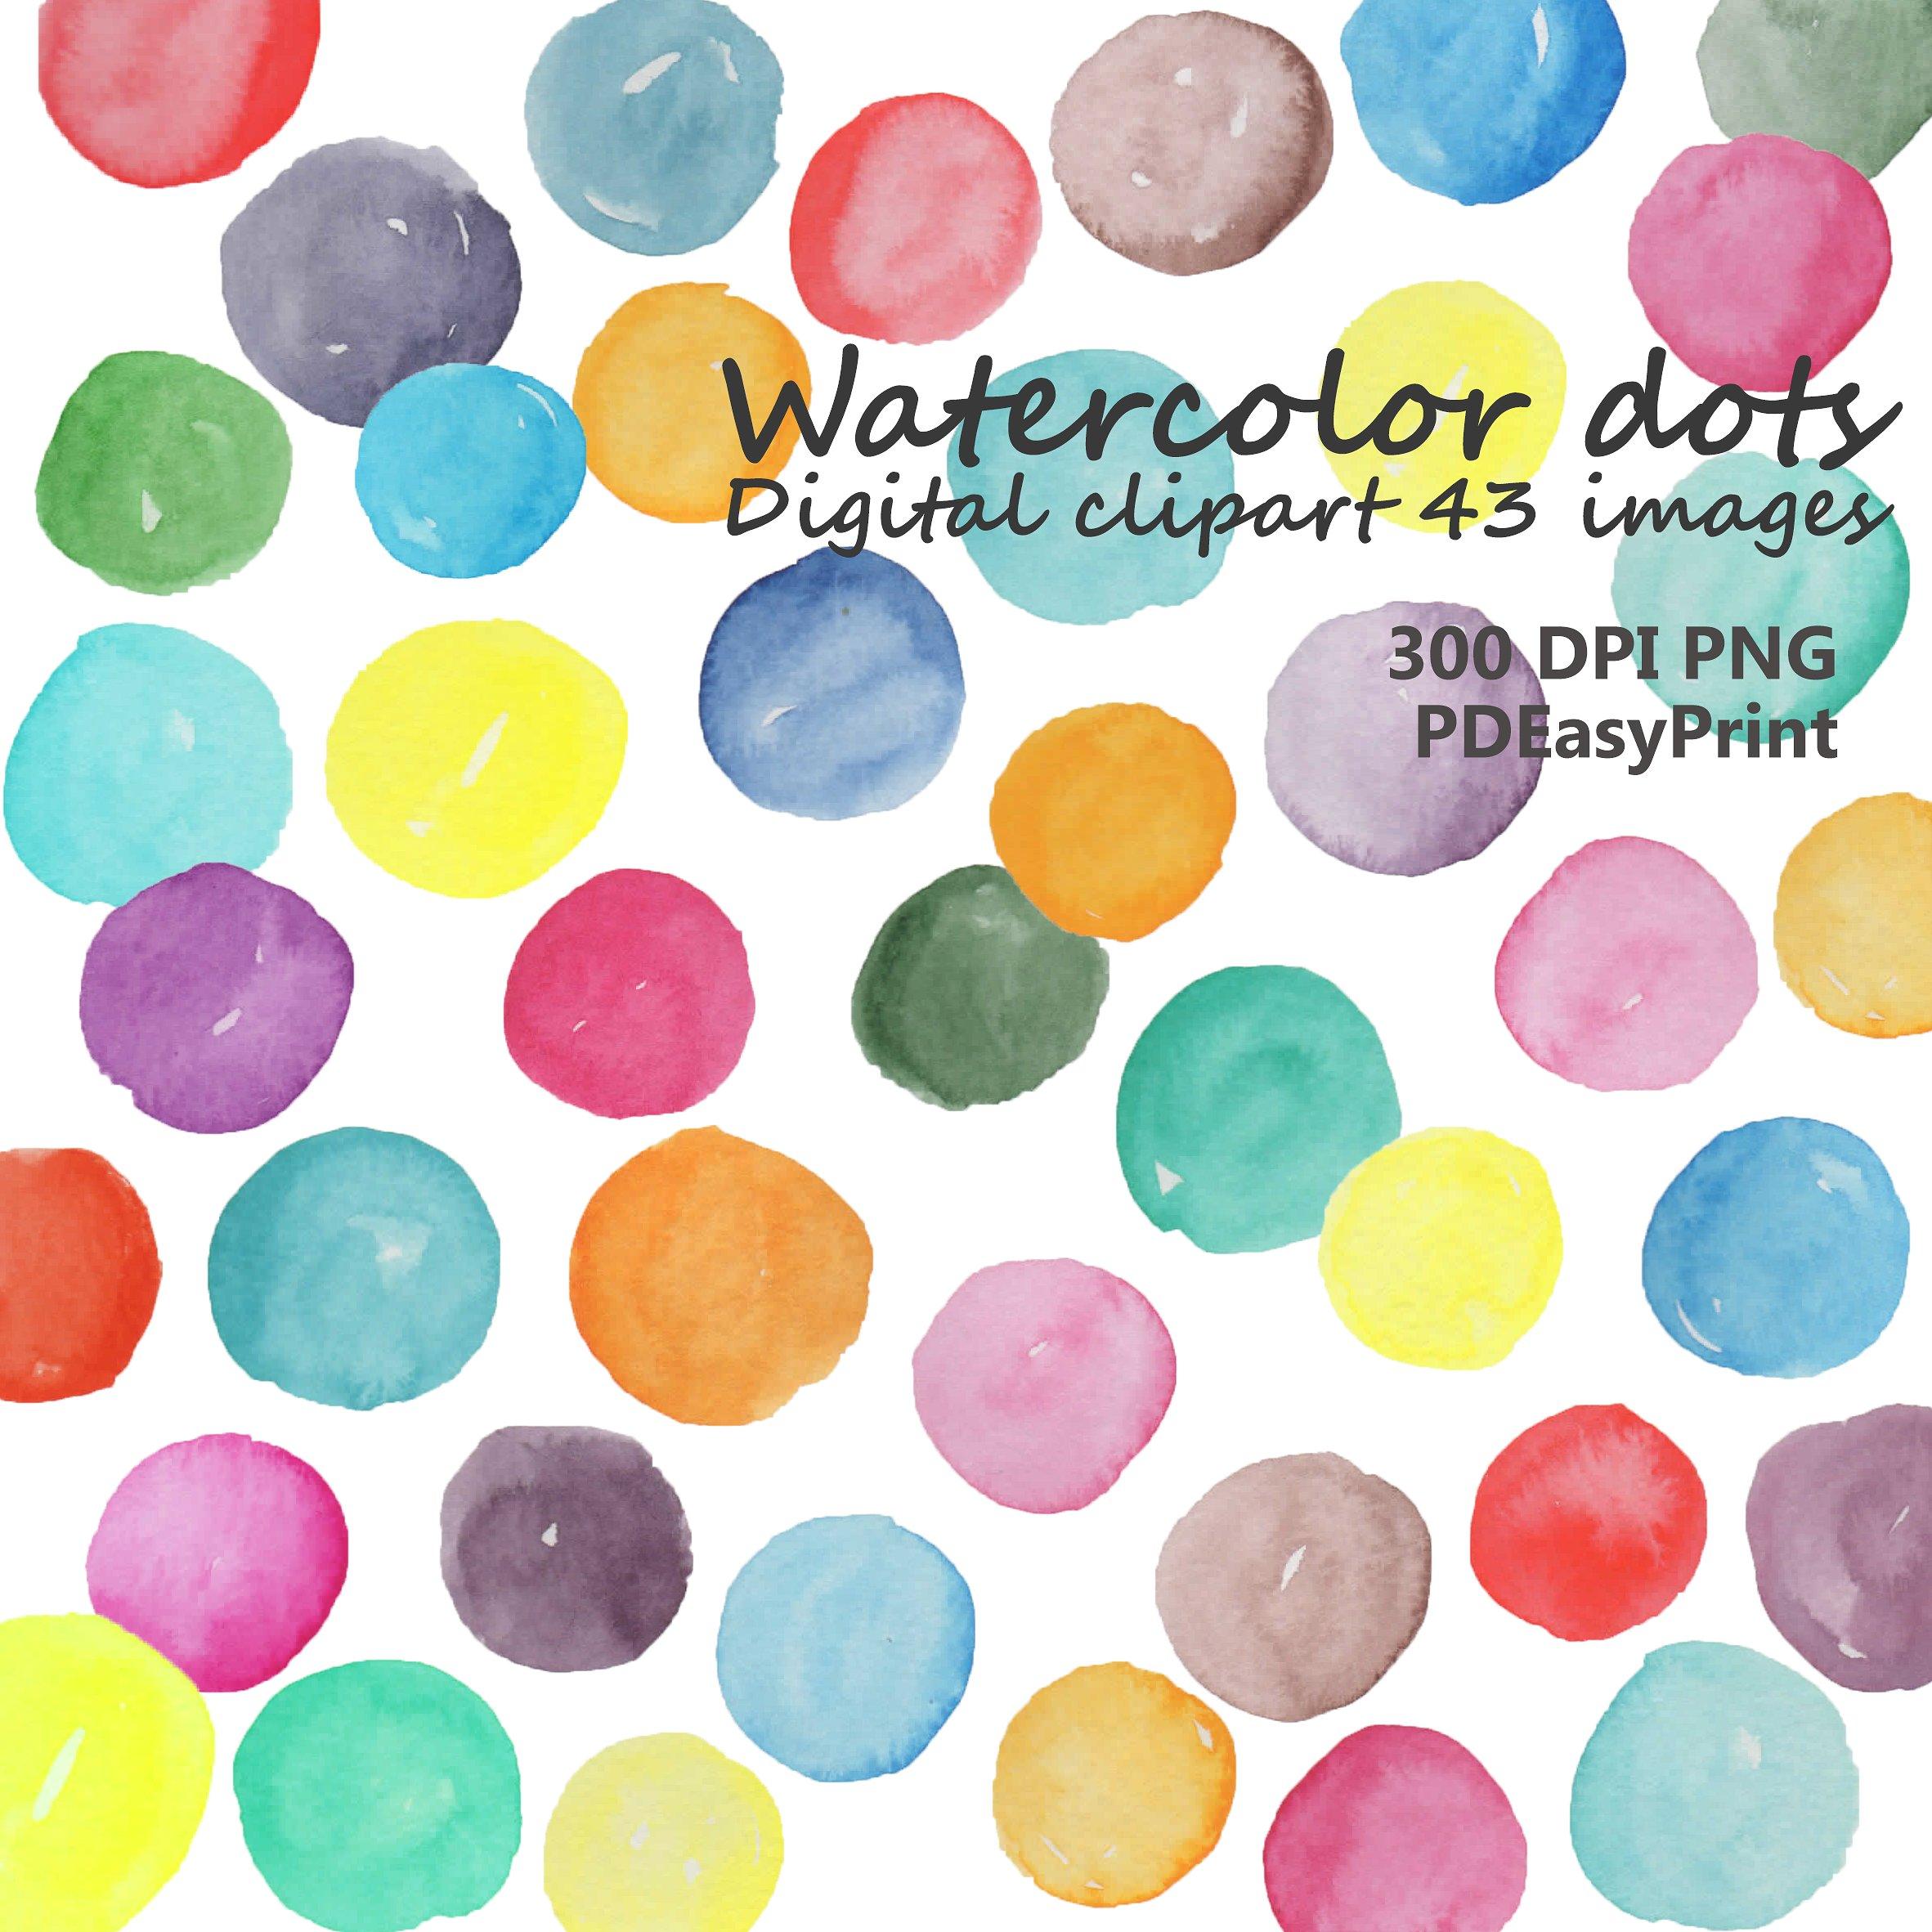 Background clipart bubble. Watercolor dot dots illustrations